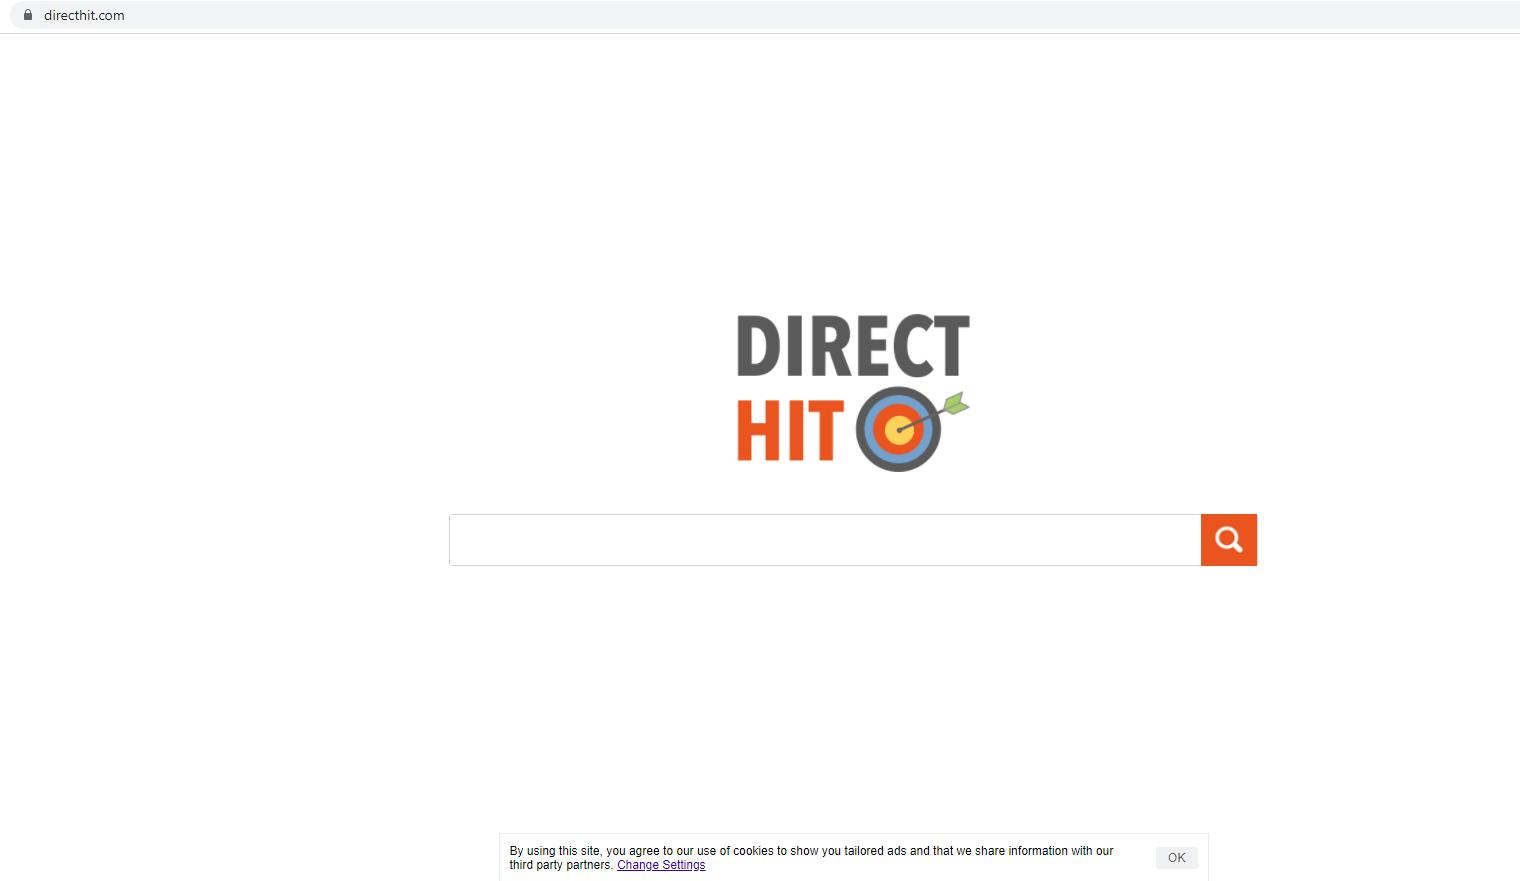 Directhit